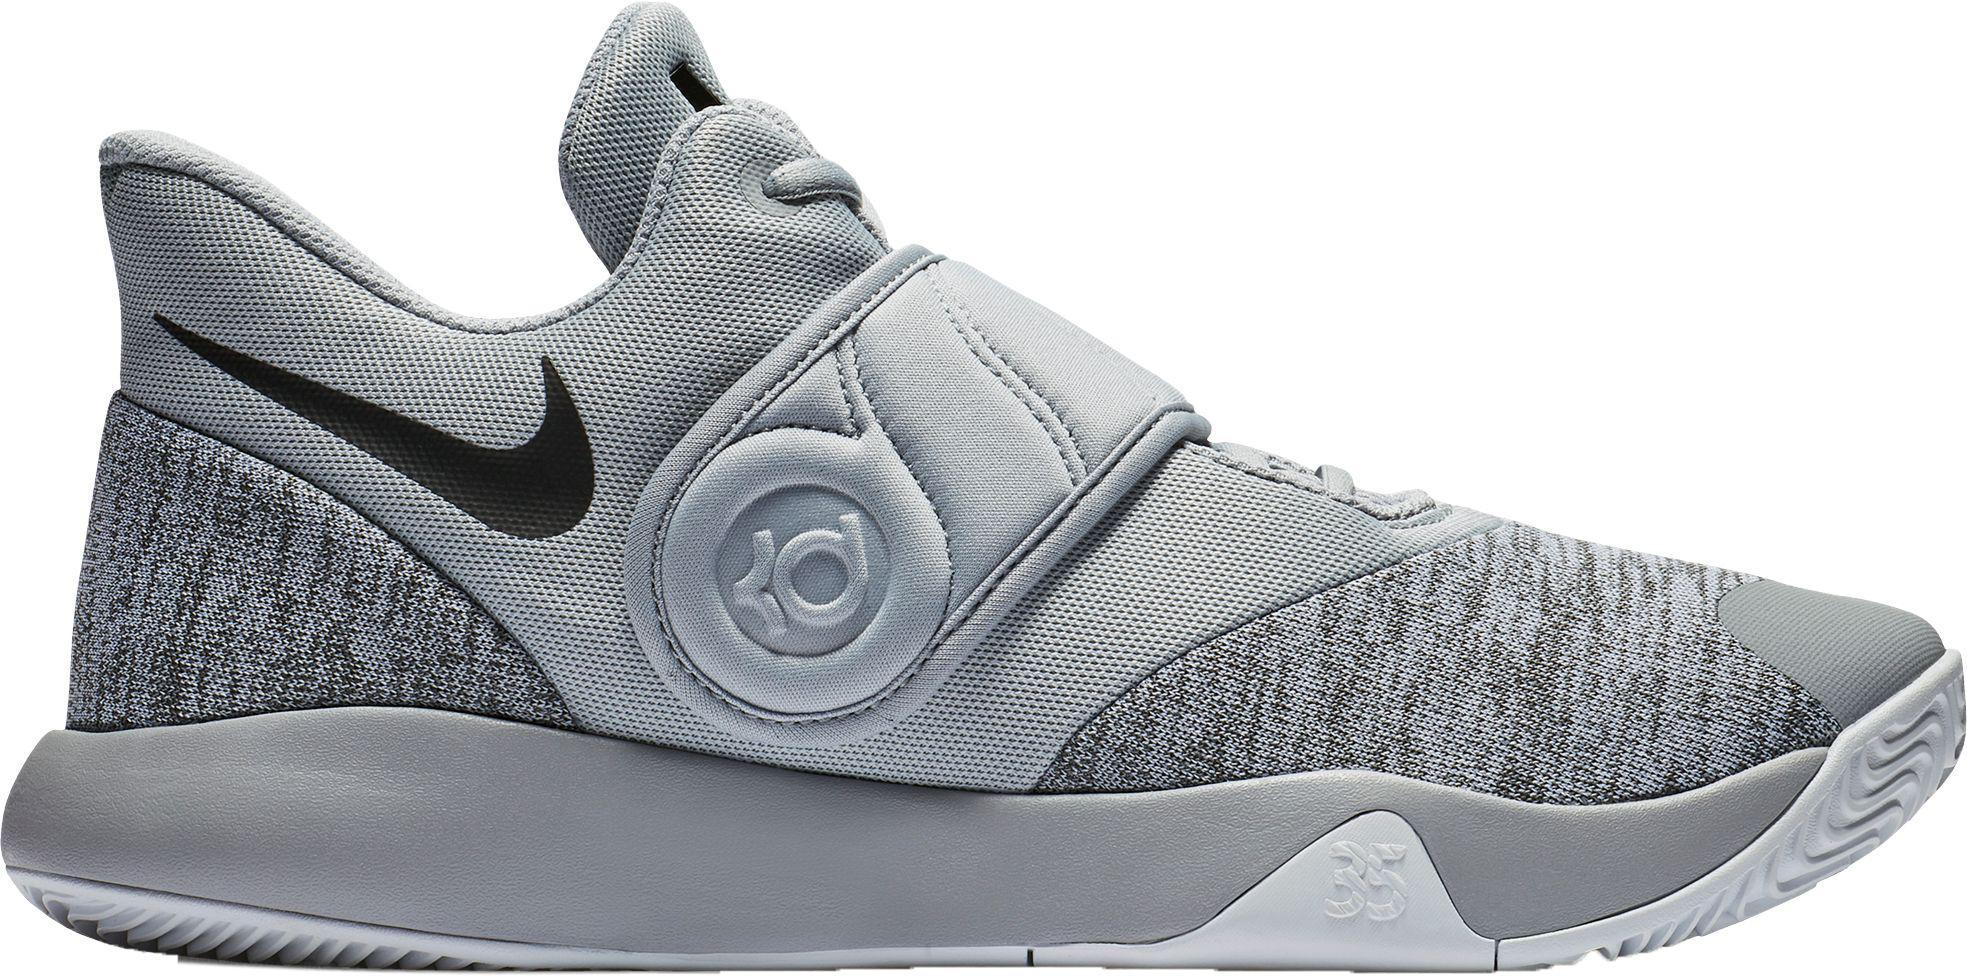 777fbe4e0e93 Lyst - Nike Kd Trey 5 Vi Basketball Shoes in Gray for Men